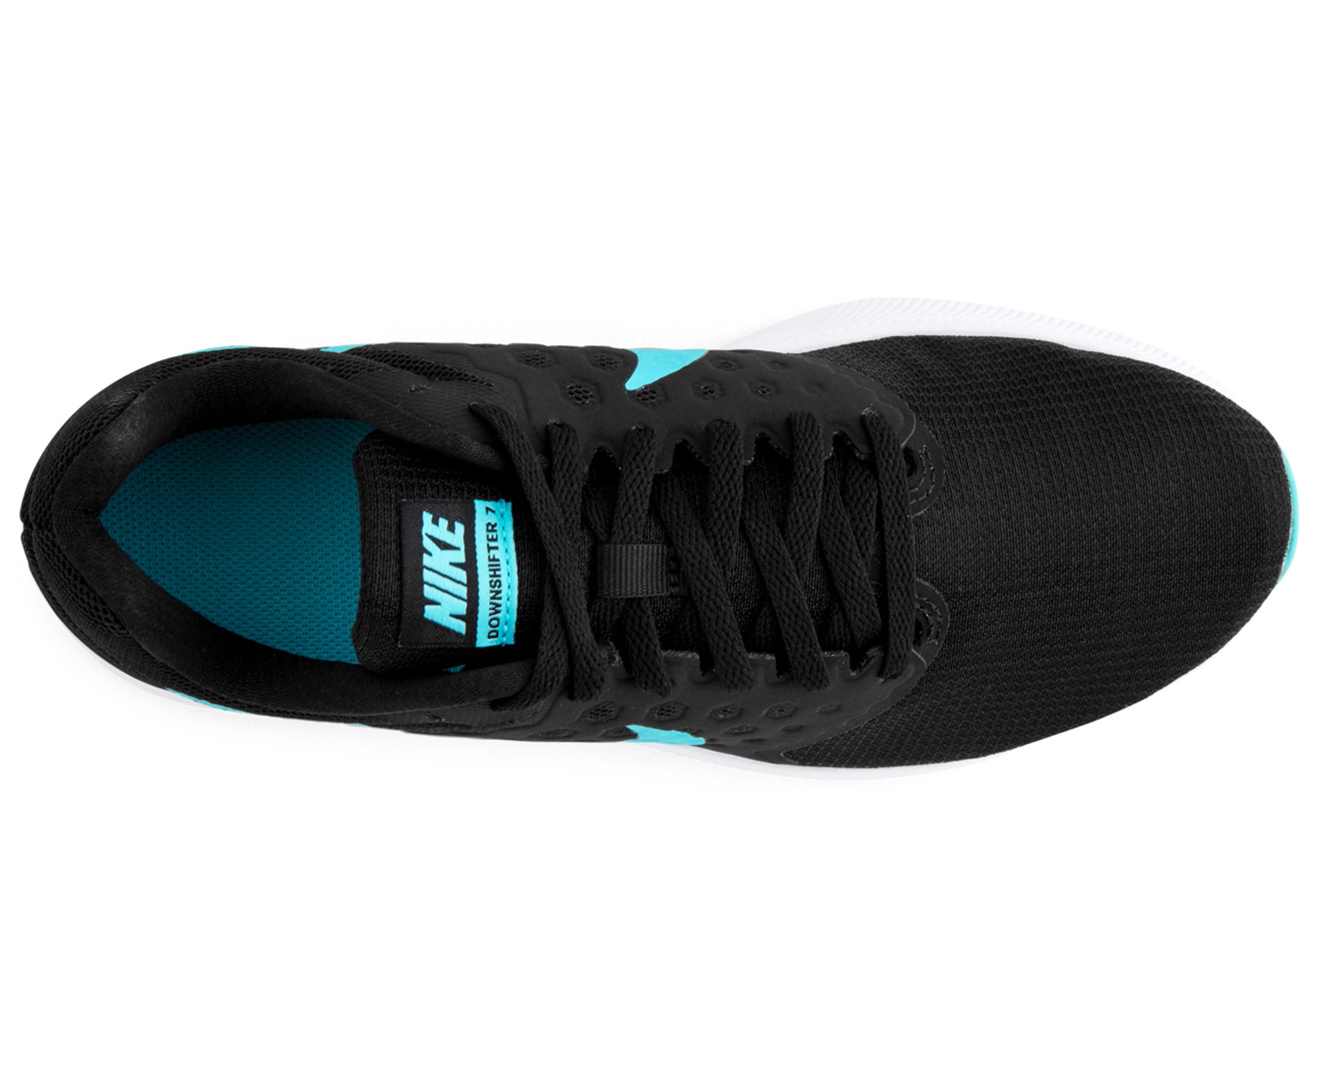 Nike Women's Downshifter 7 Shoe BlackPolarised BlueWhite